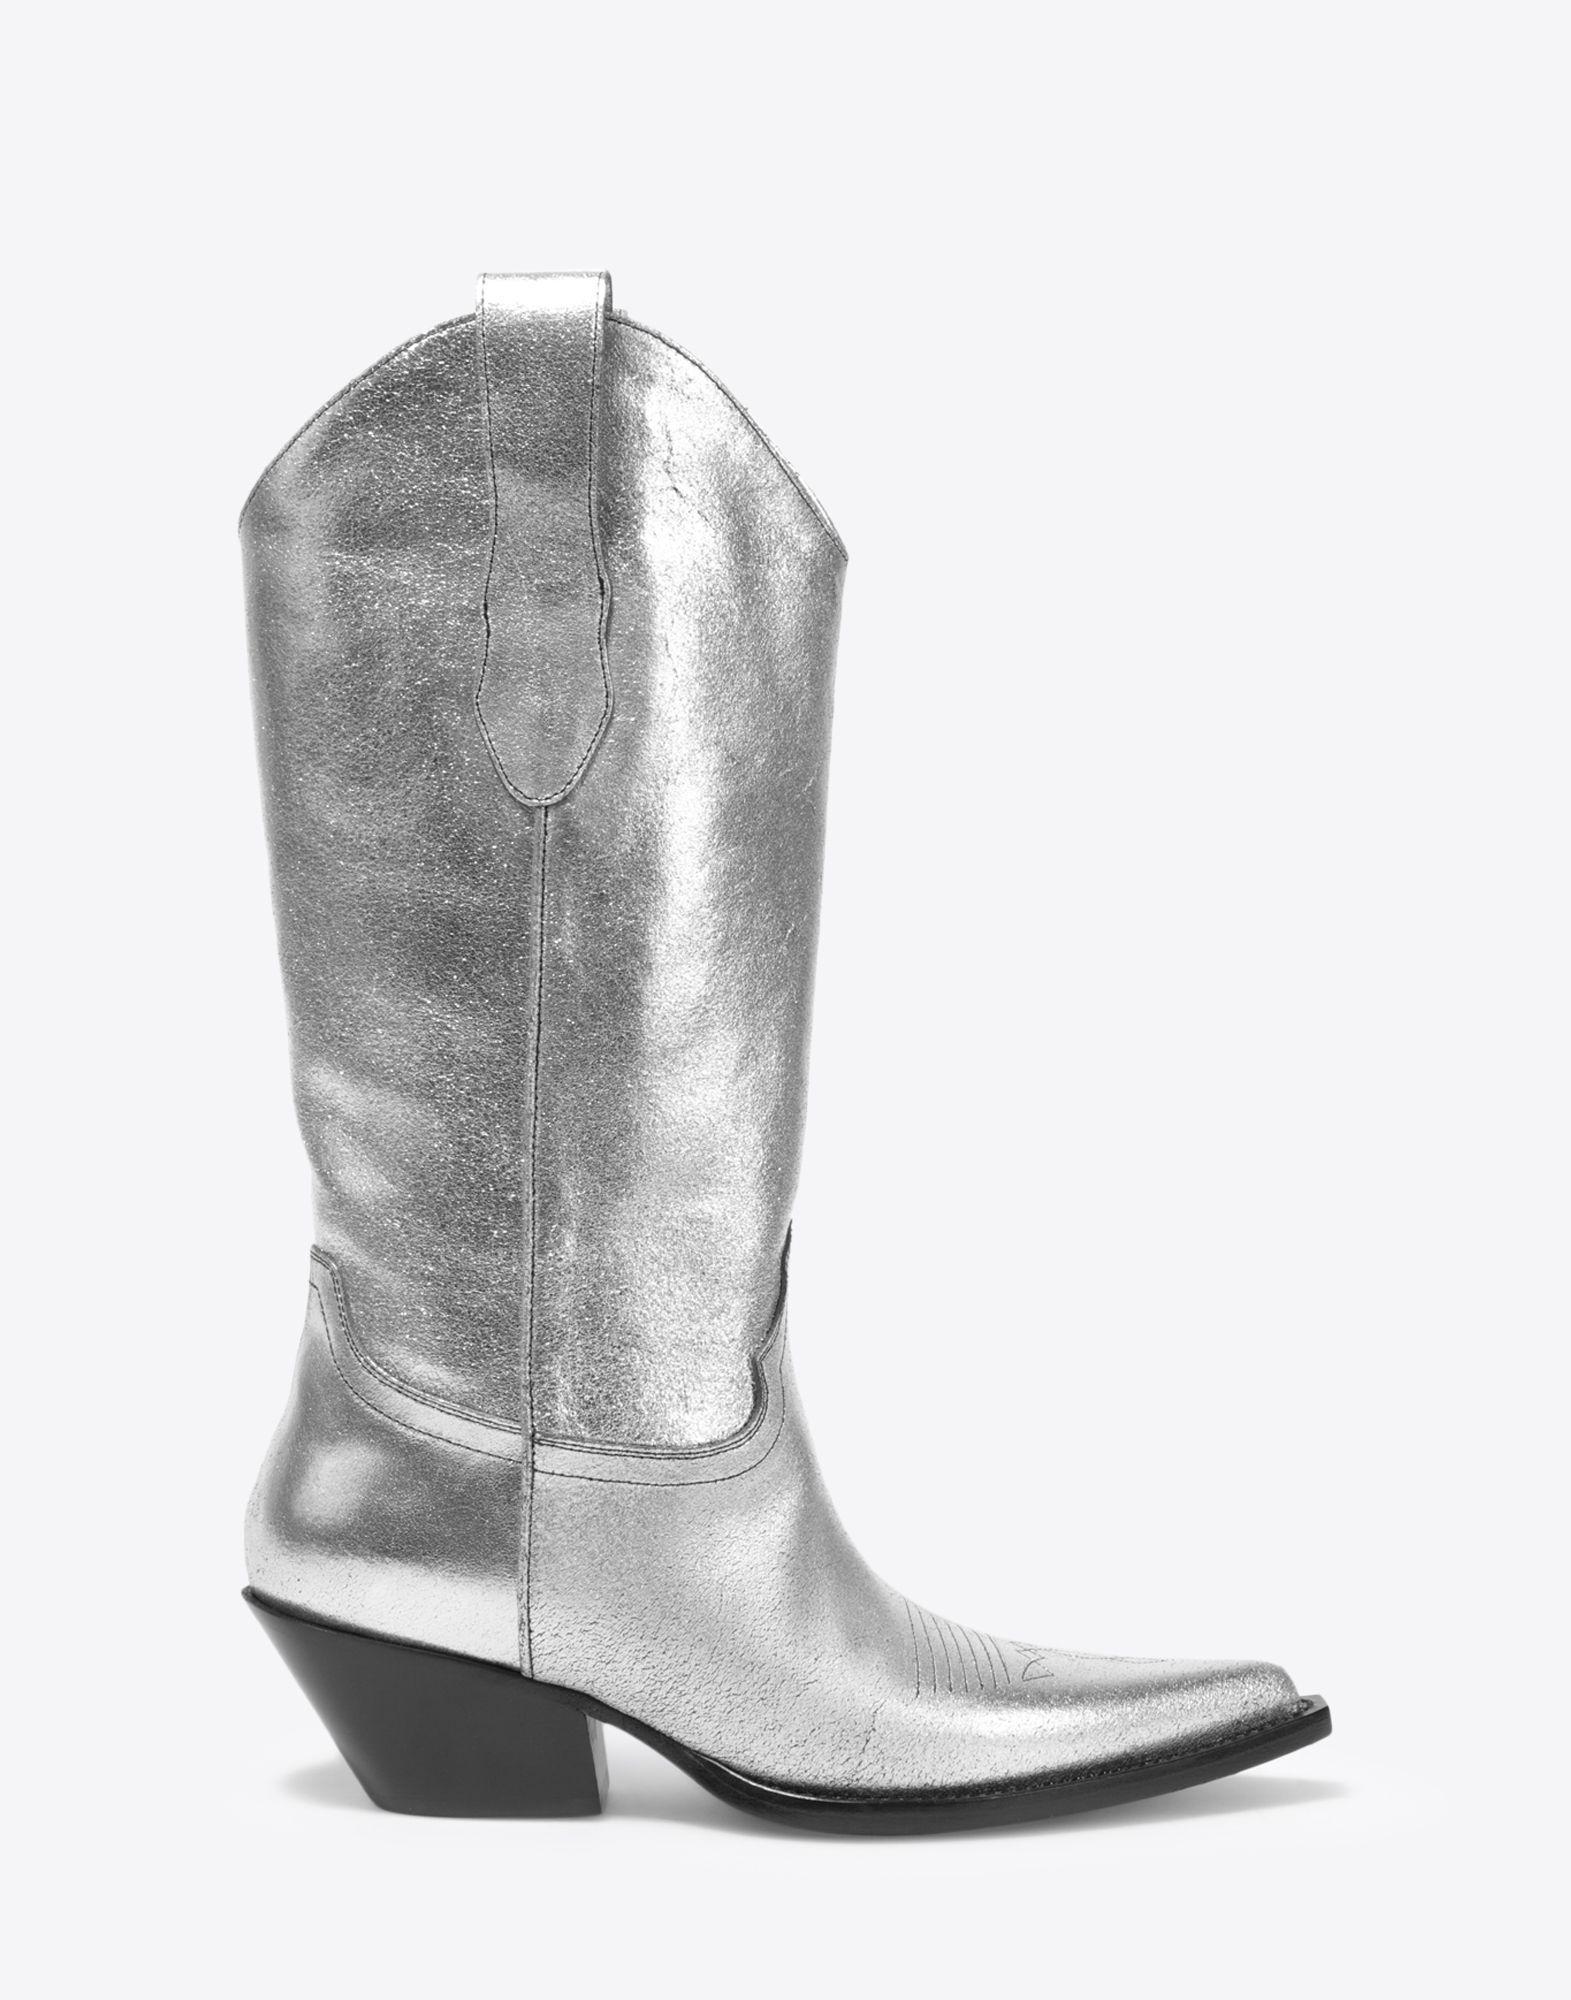 0b2a8431ec59d Lyst - Maison Margiela High Silver Cowboy Boots in Metallic